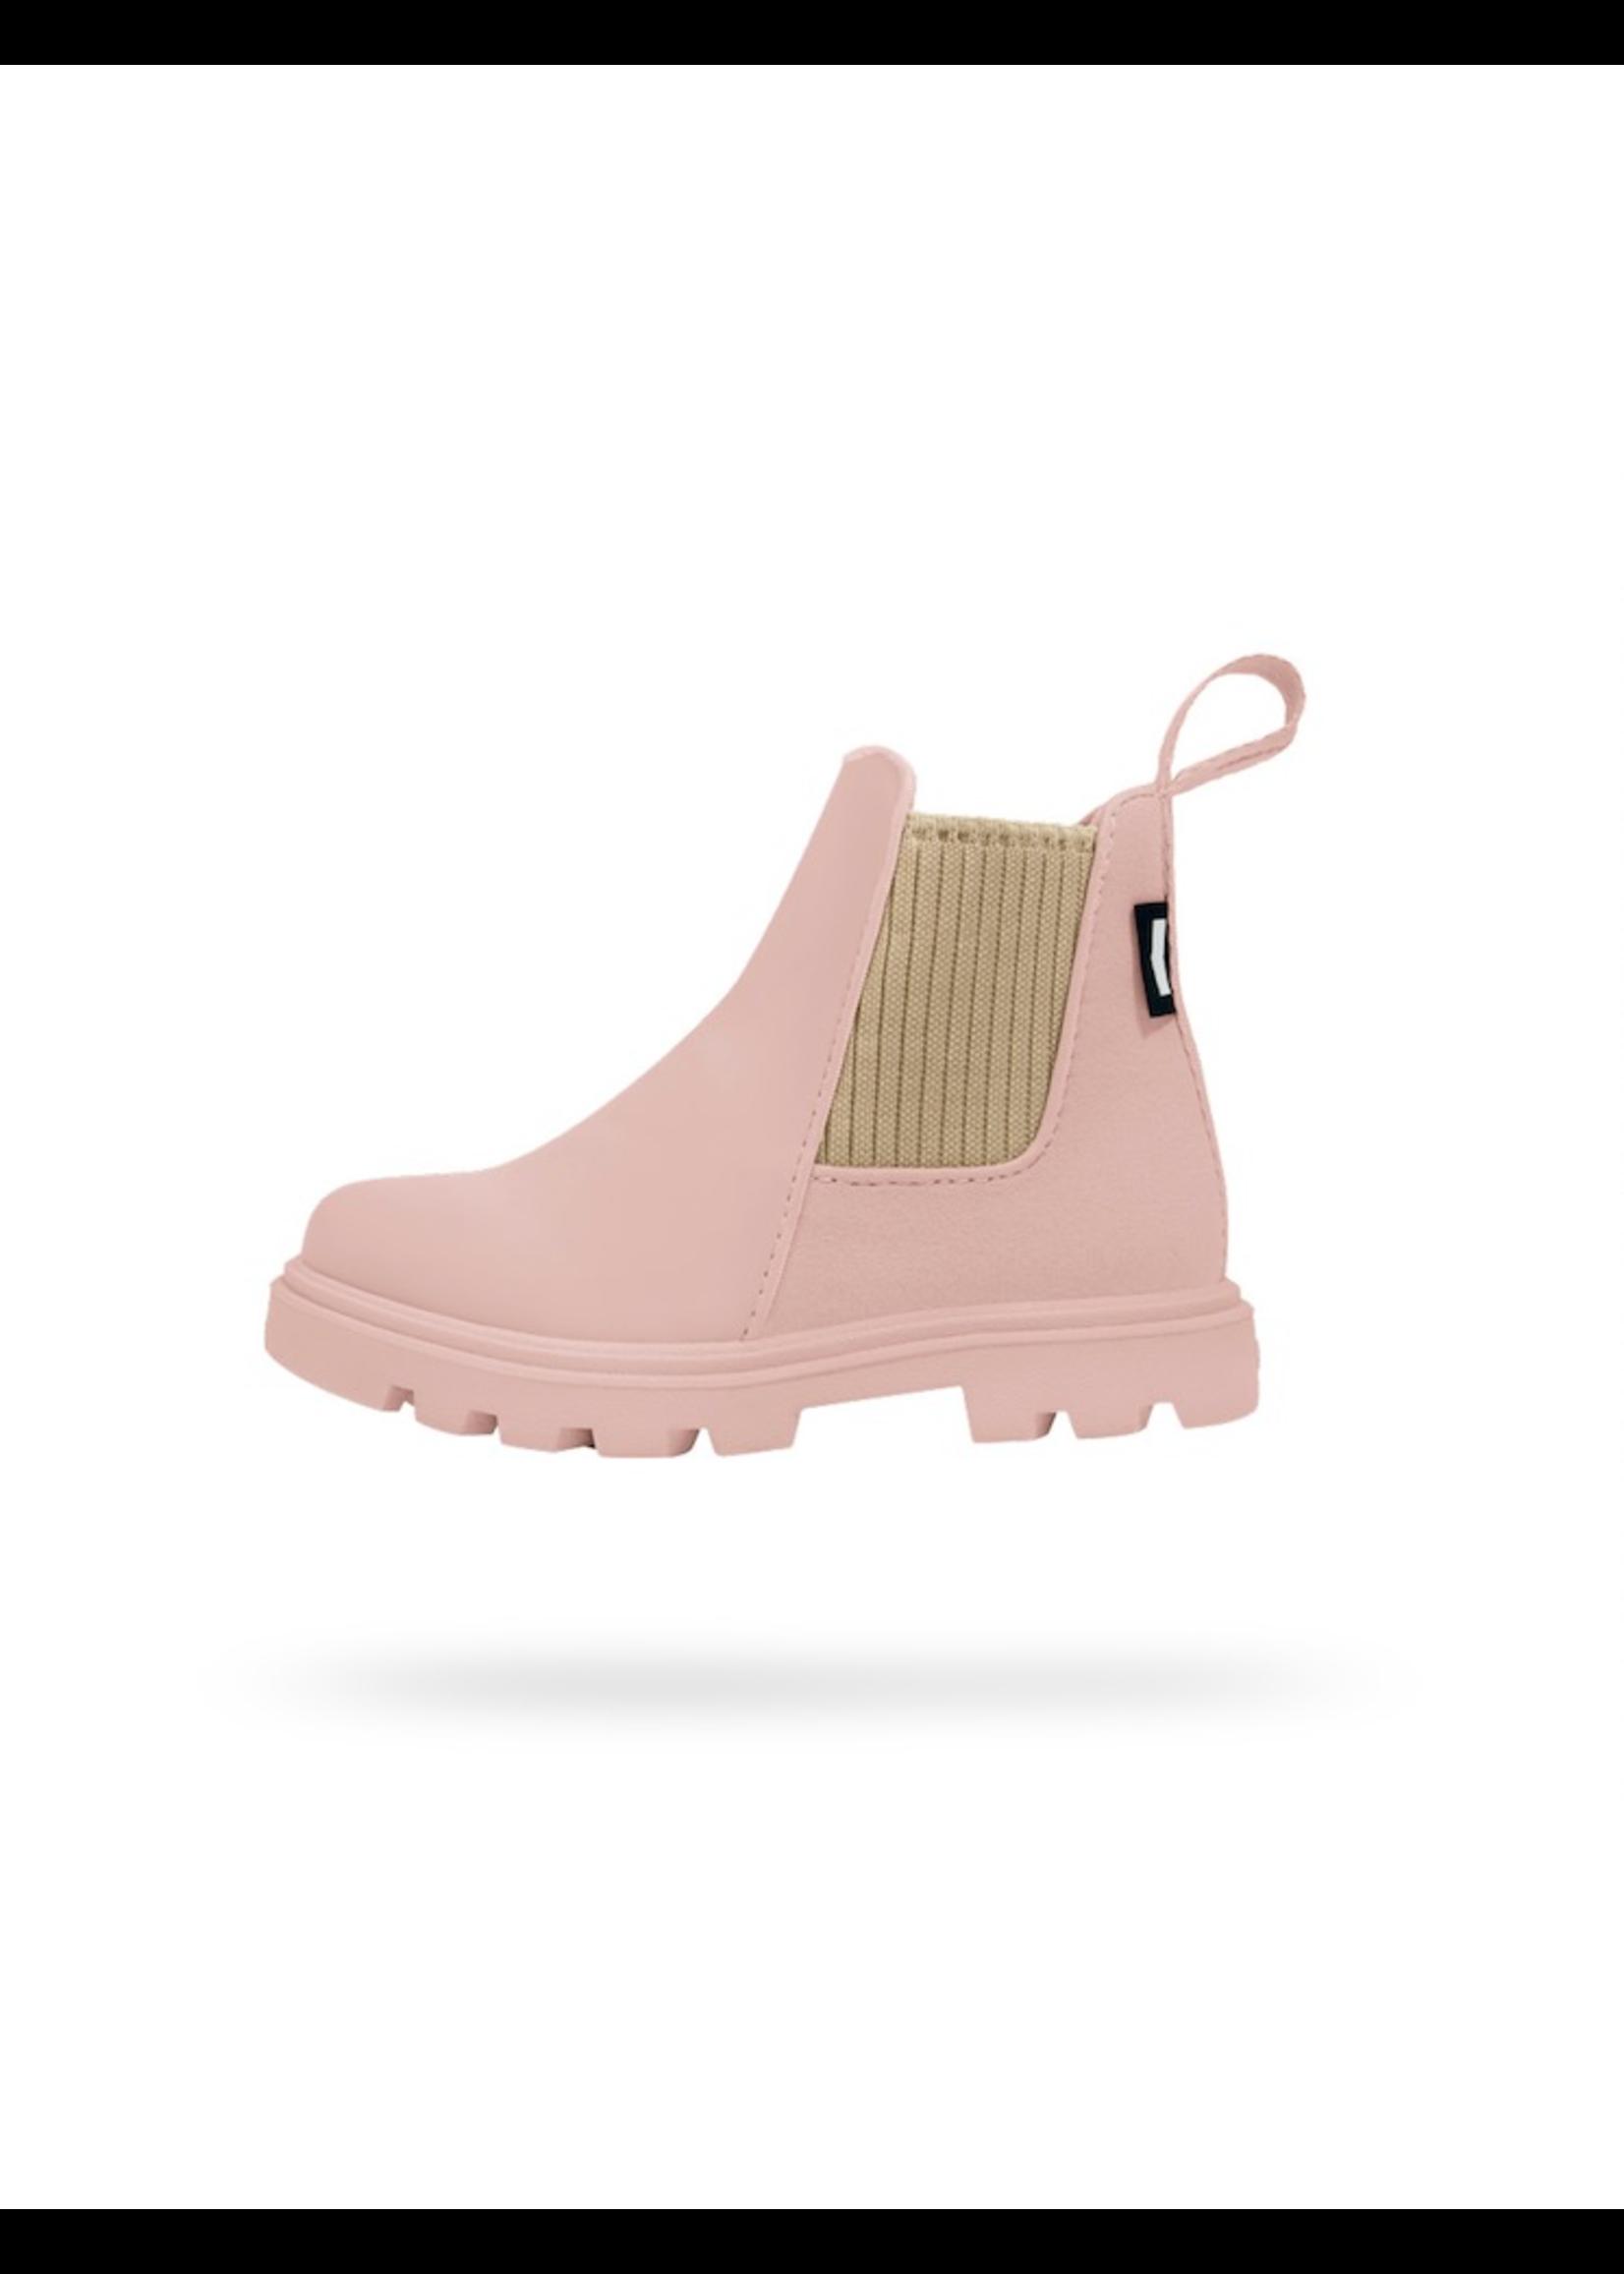 Native Shoes Native, Kensington Treklite Child Boots for Kids